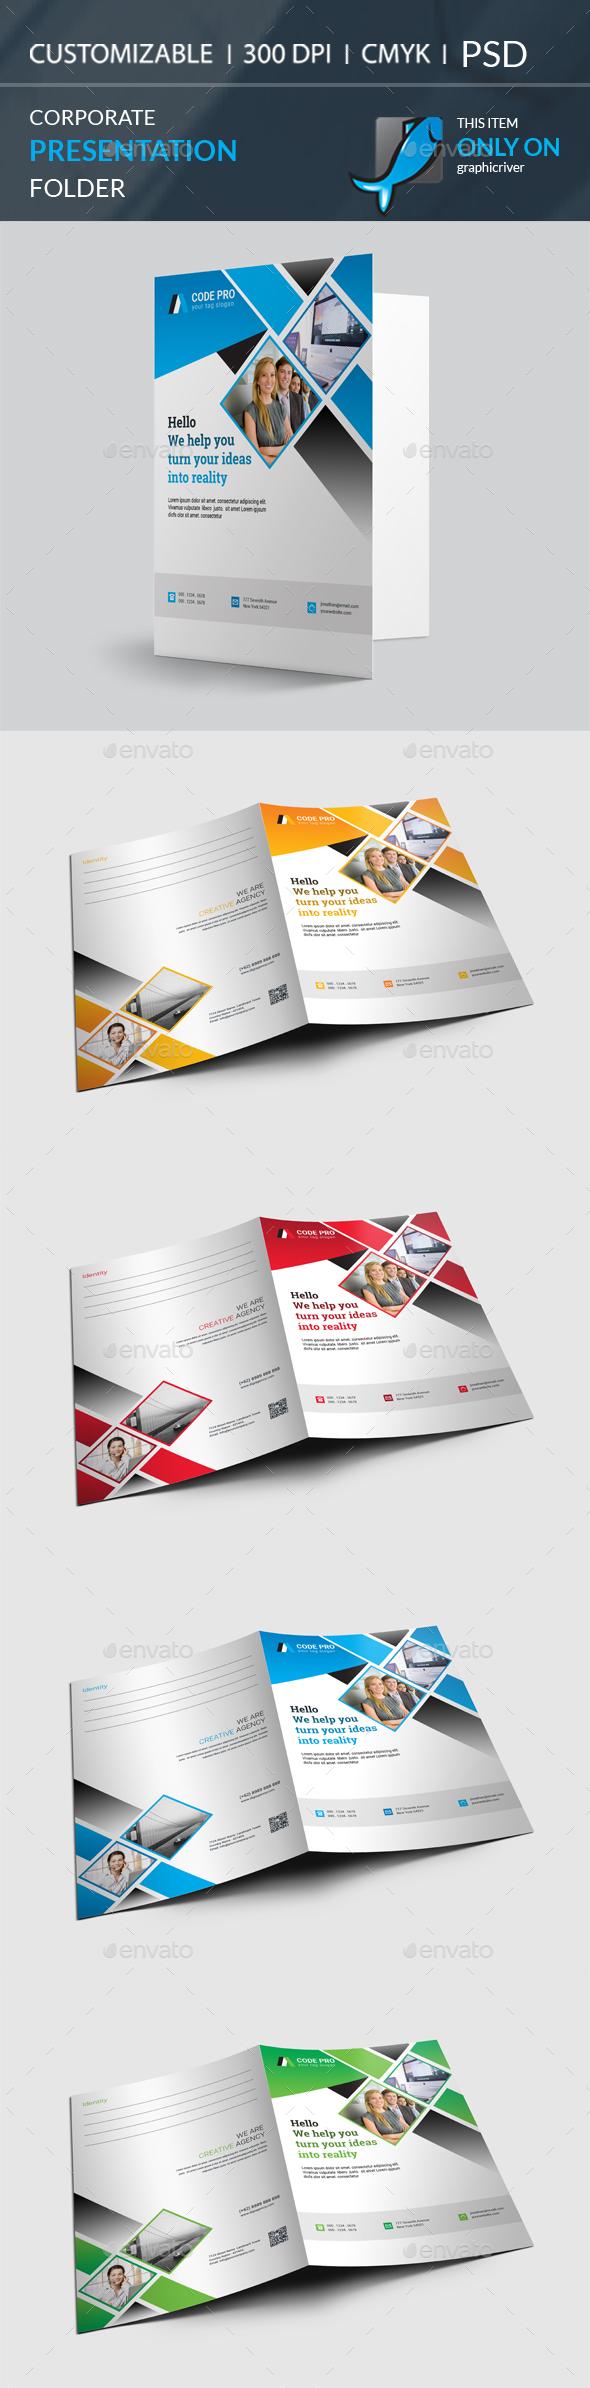 GraphicRiver Presentation Folder 20634731